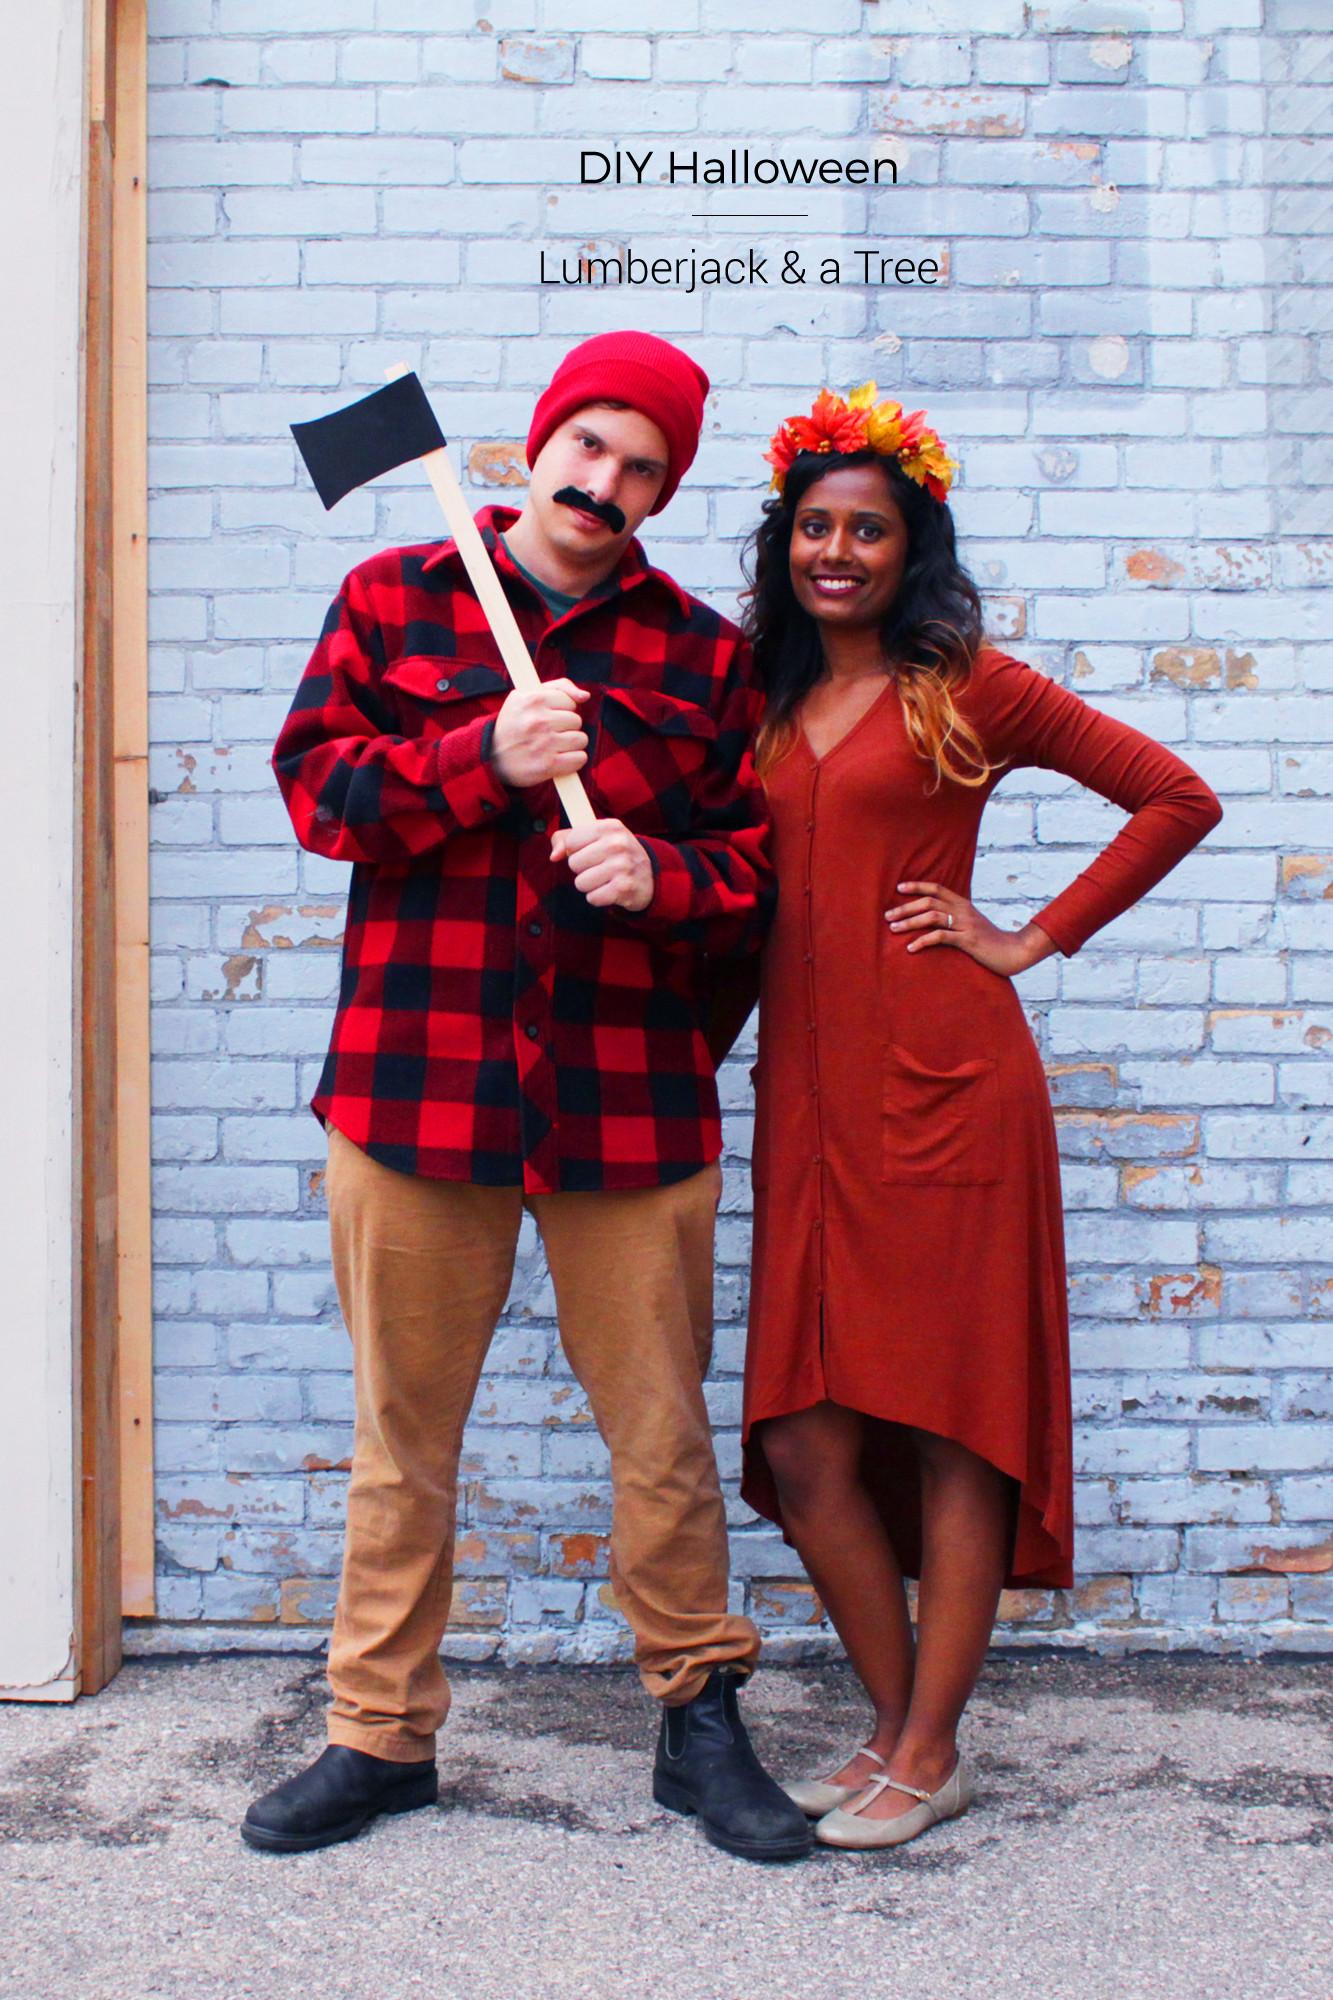 Tree Costumes DIY  DIY Halloween Couples Costume Lumberjack & a Tree